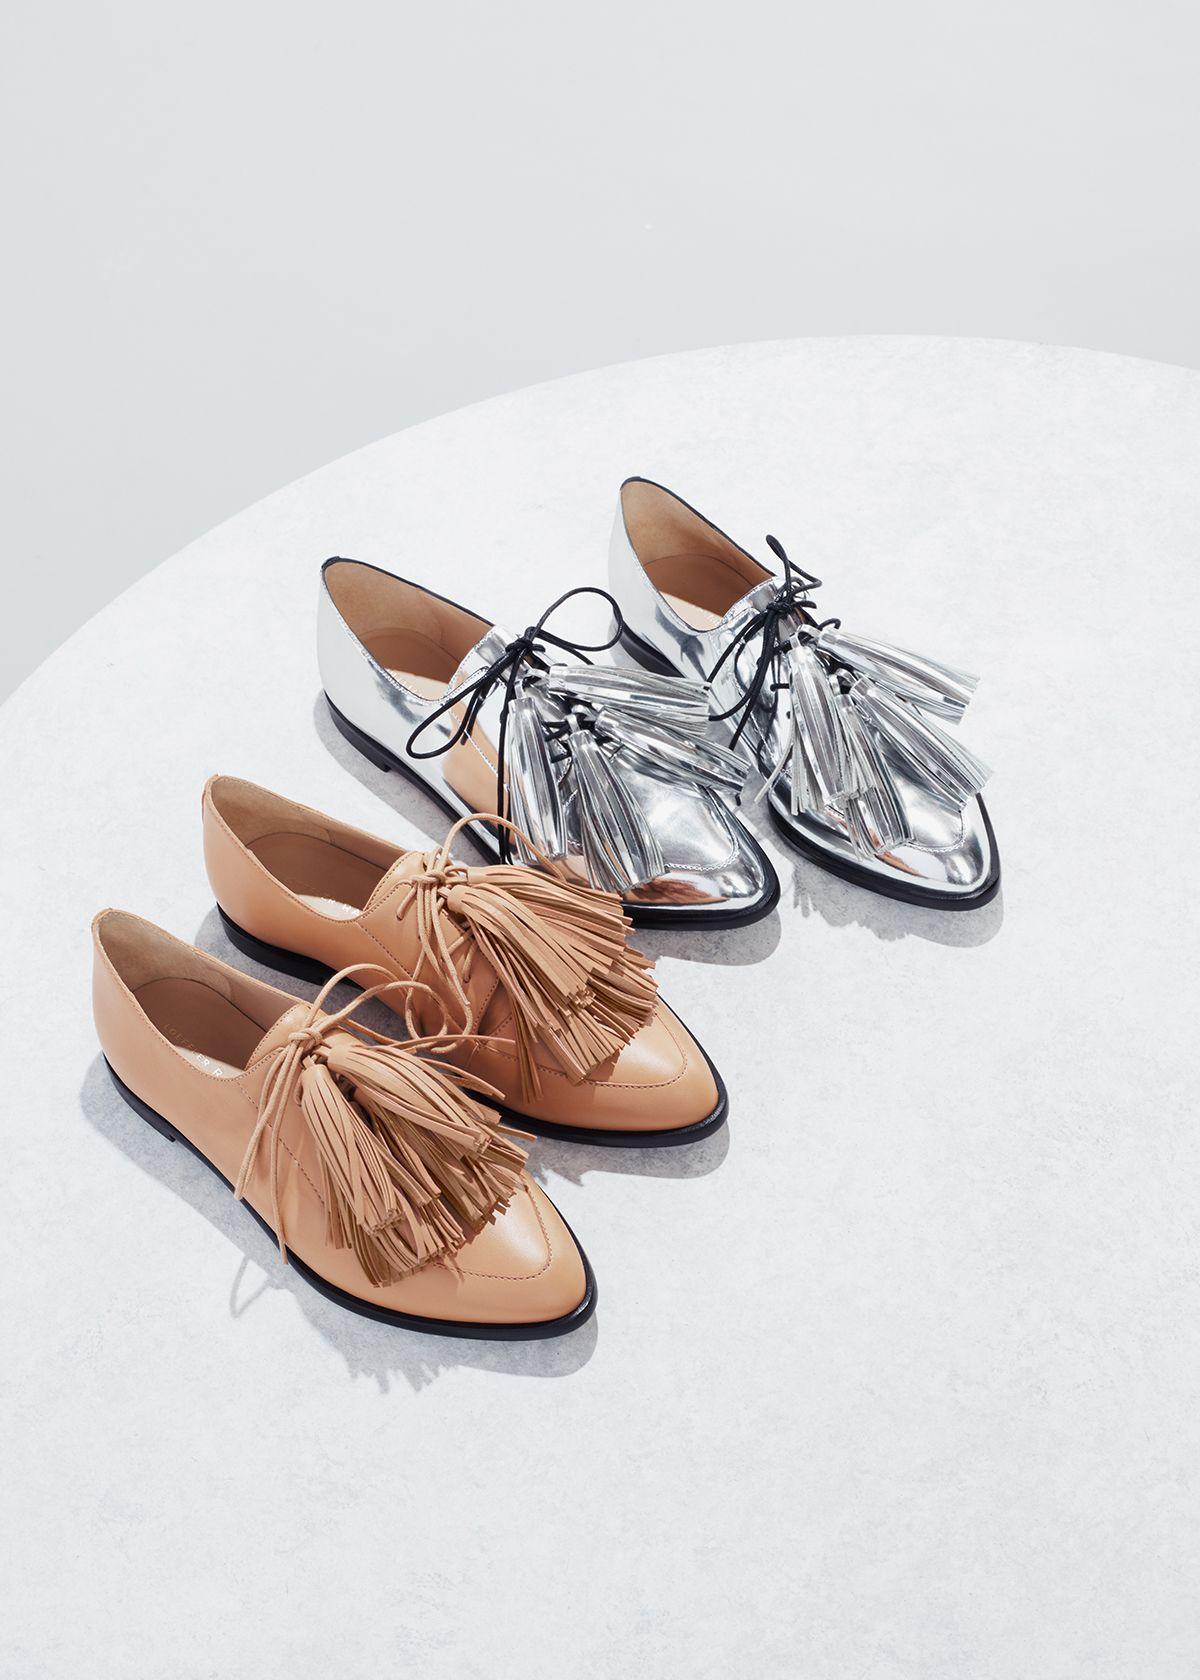 Loeffler Randall FW16 Lookbook   Room for more...   Shoes, Footwear ... b0b30c4728c